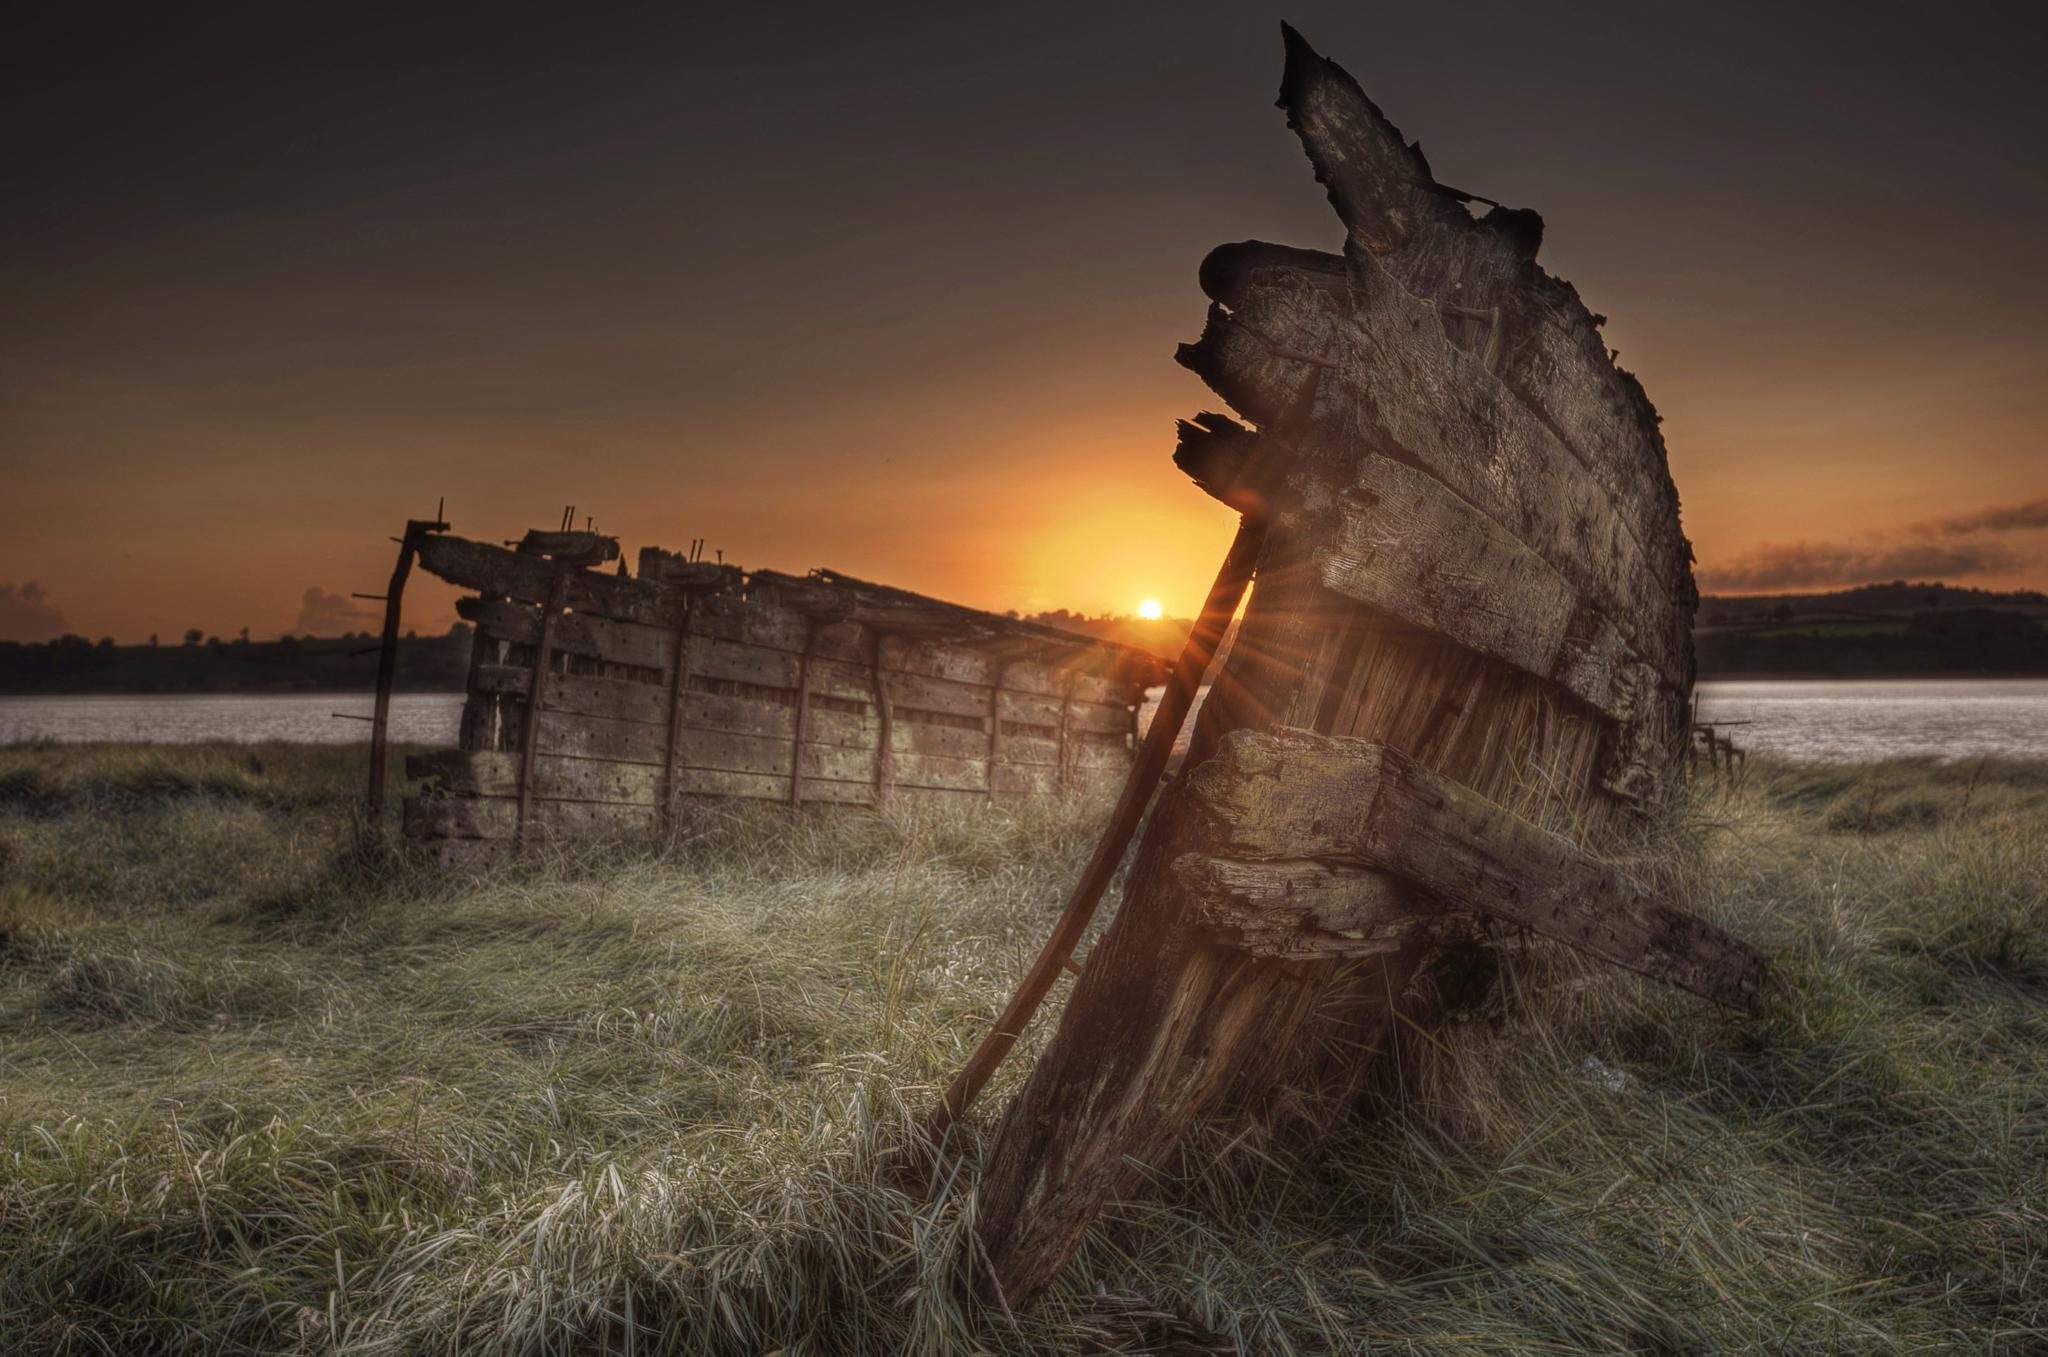 Purton Ship graveyard by simongerhand